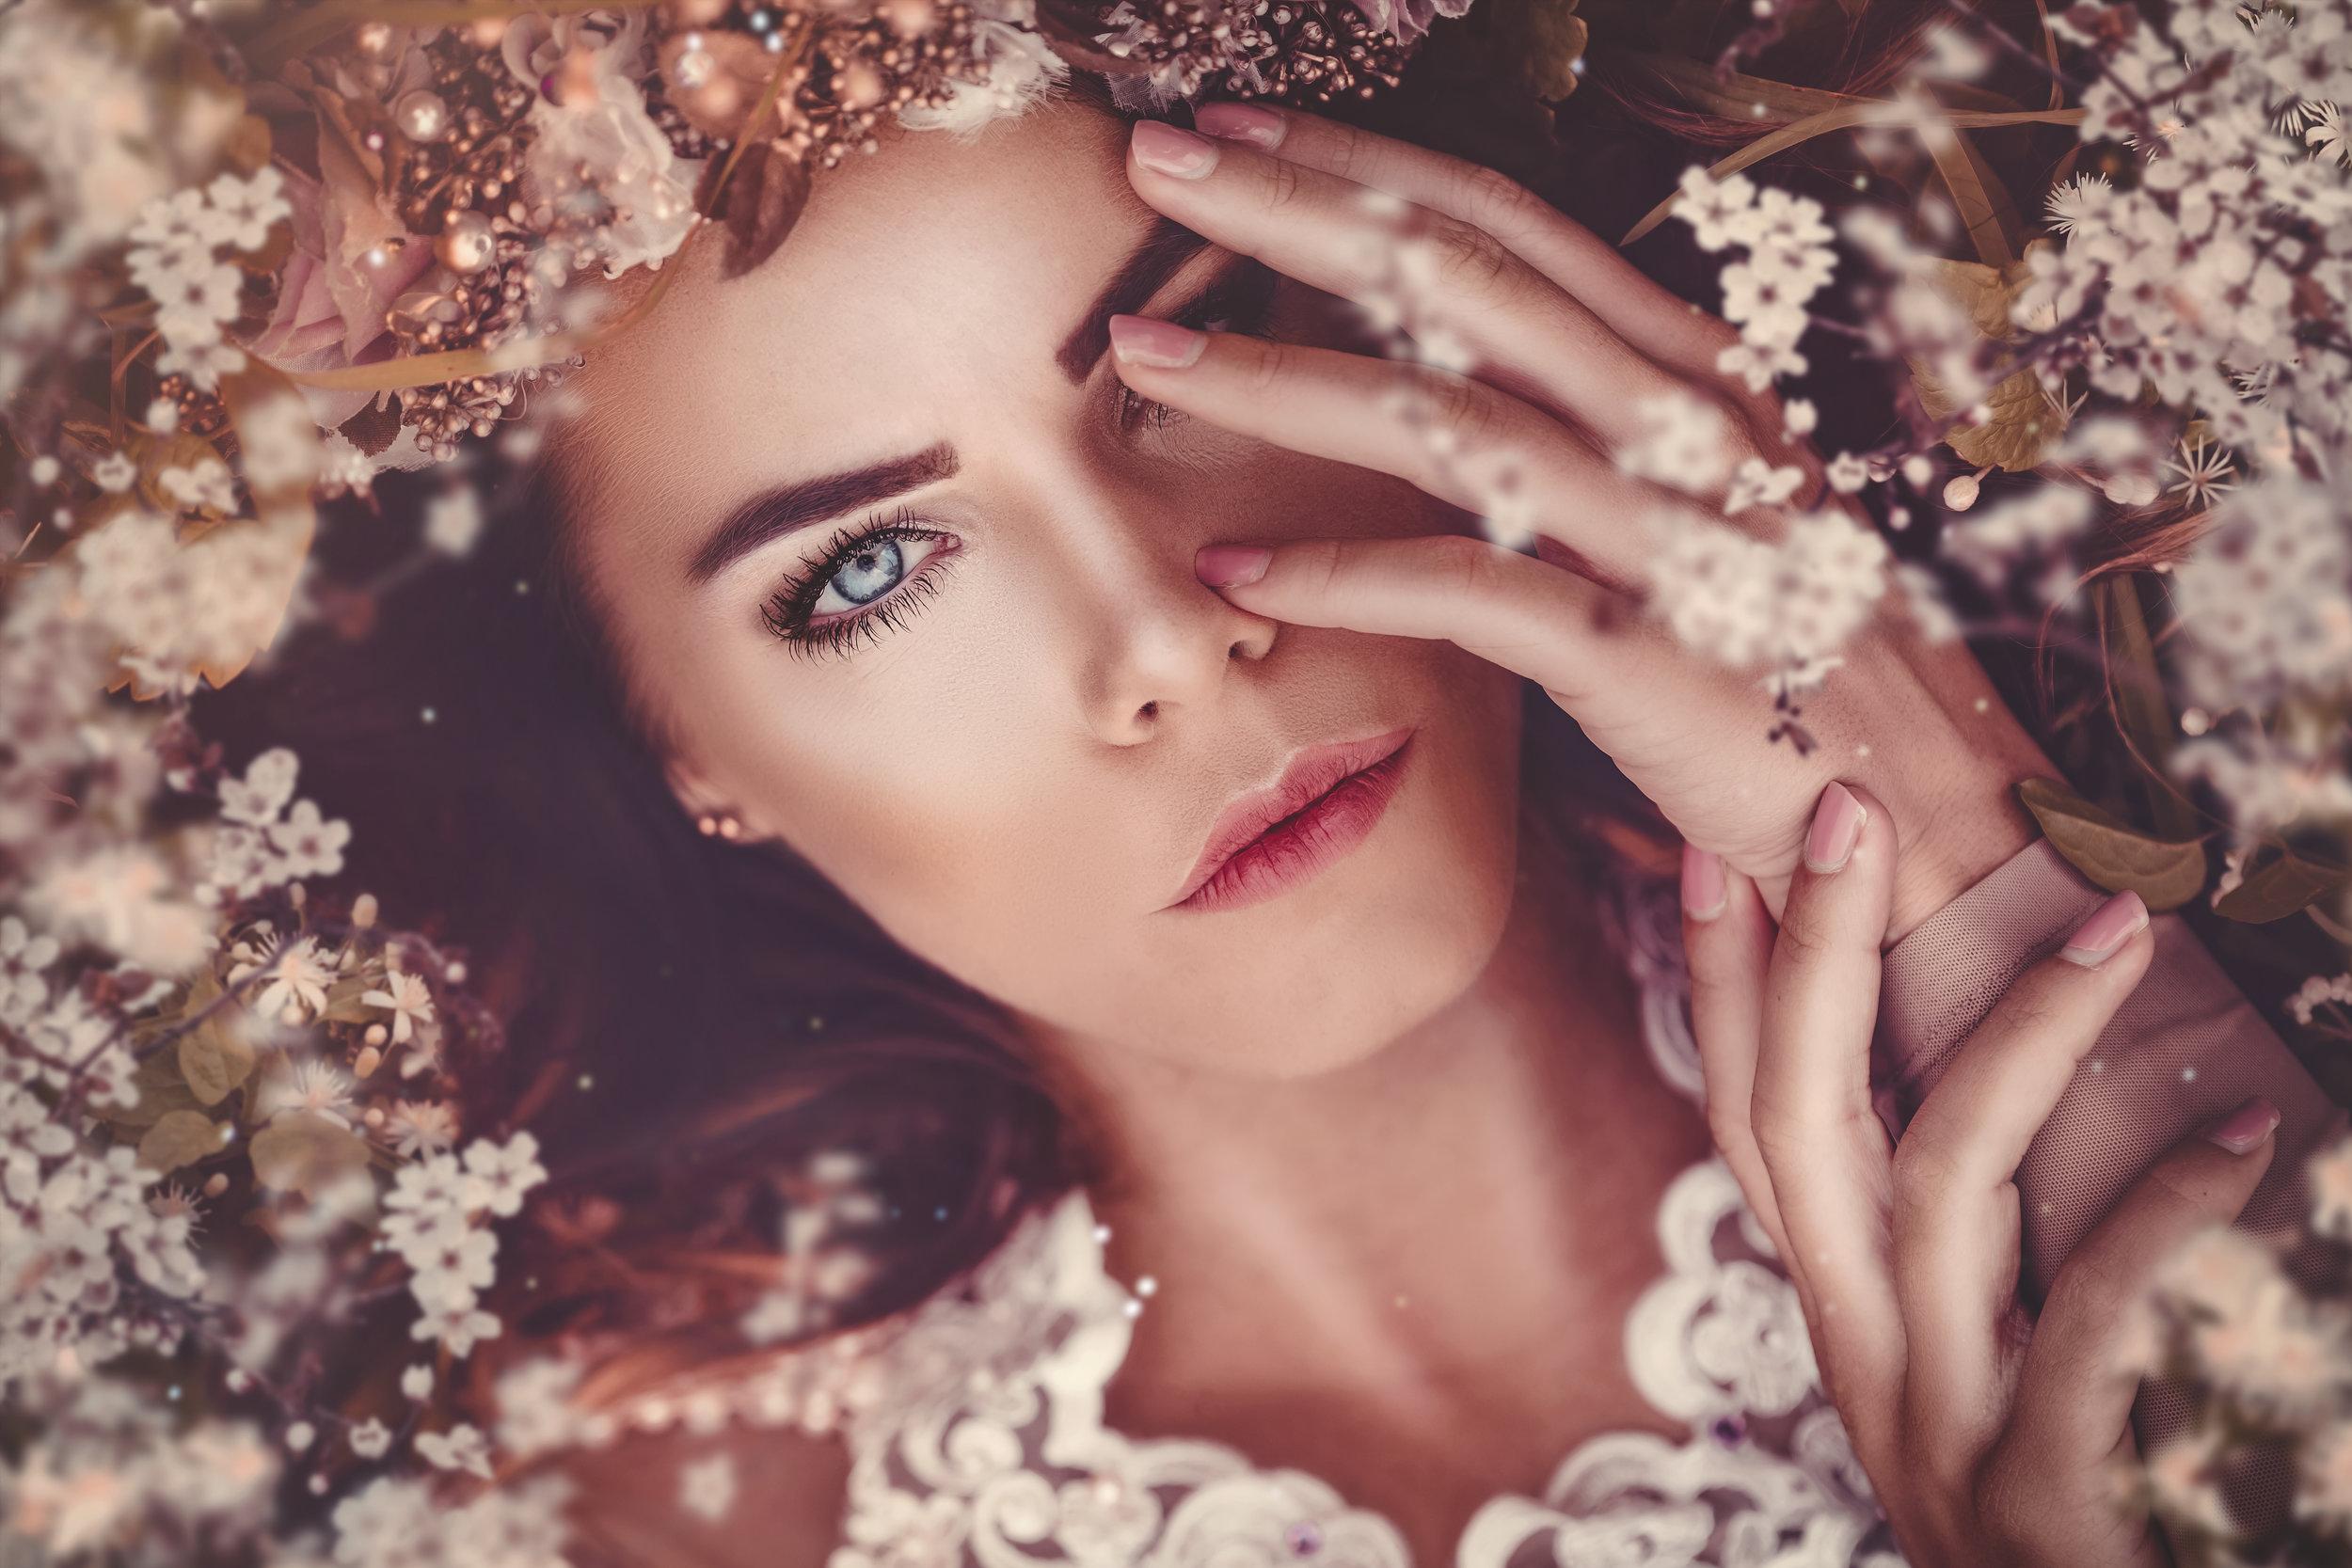 LauraHelena in LINZ am 14. September 2019   Fantasievolle Bildwelten erschaffen